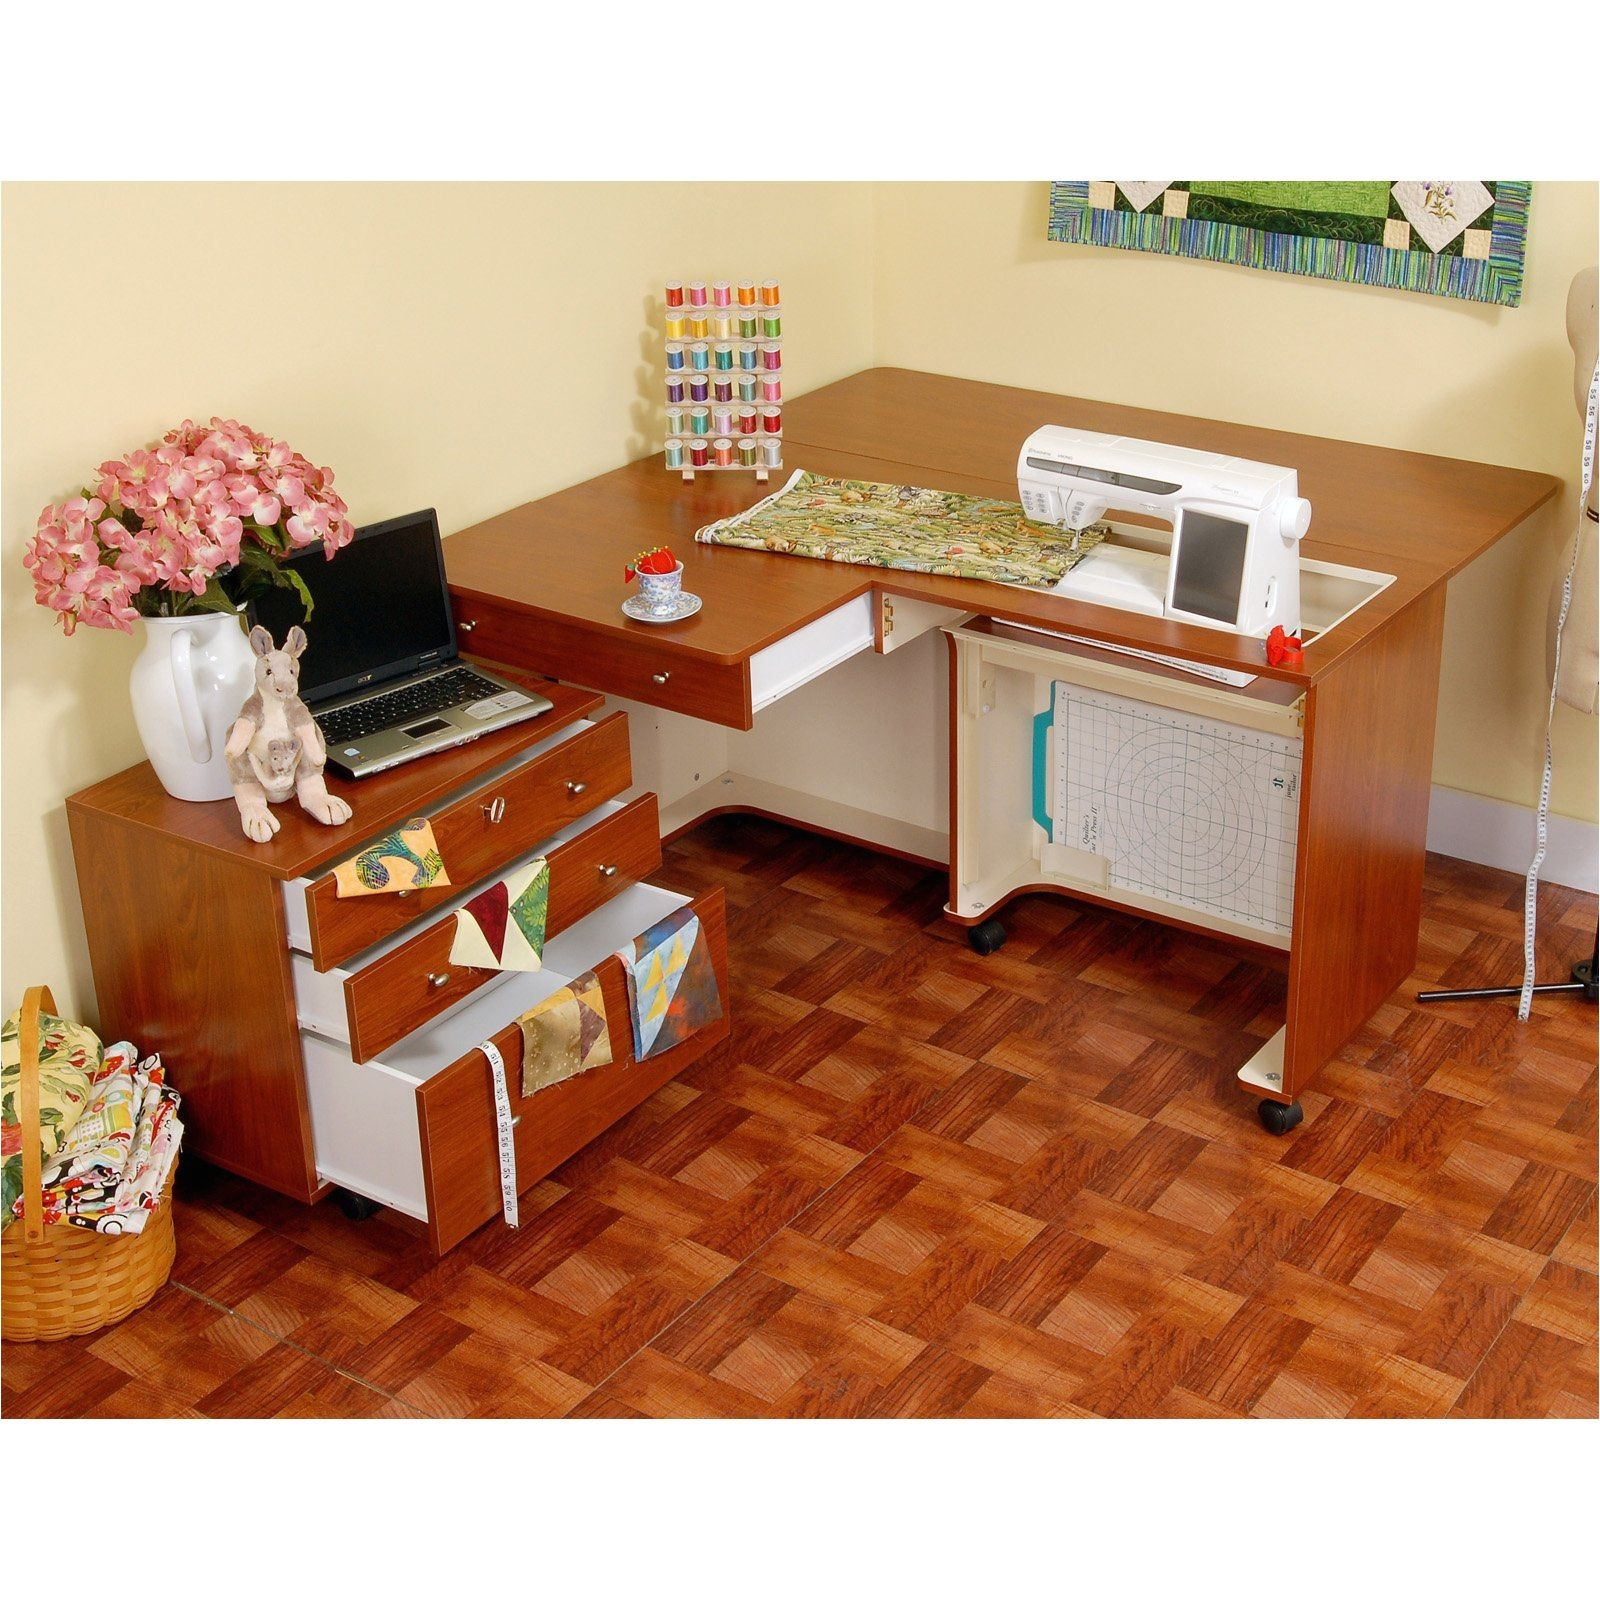 kangaroo kabinets kangaroo joey sewing cabinet with free chair